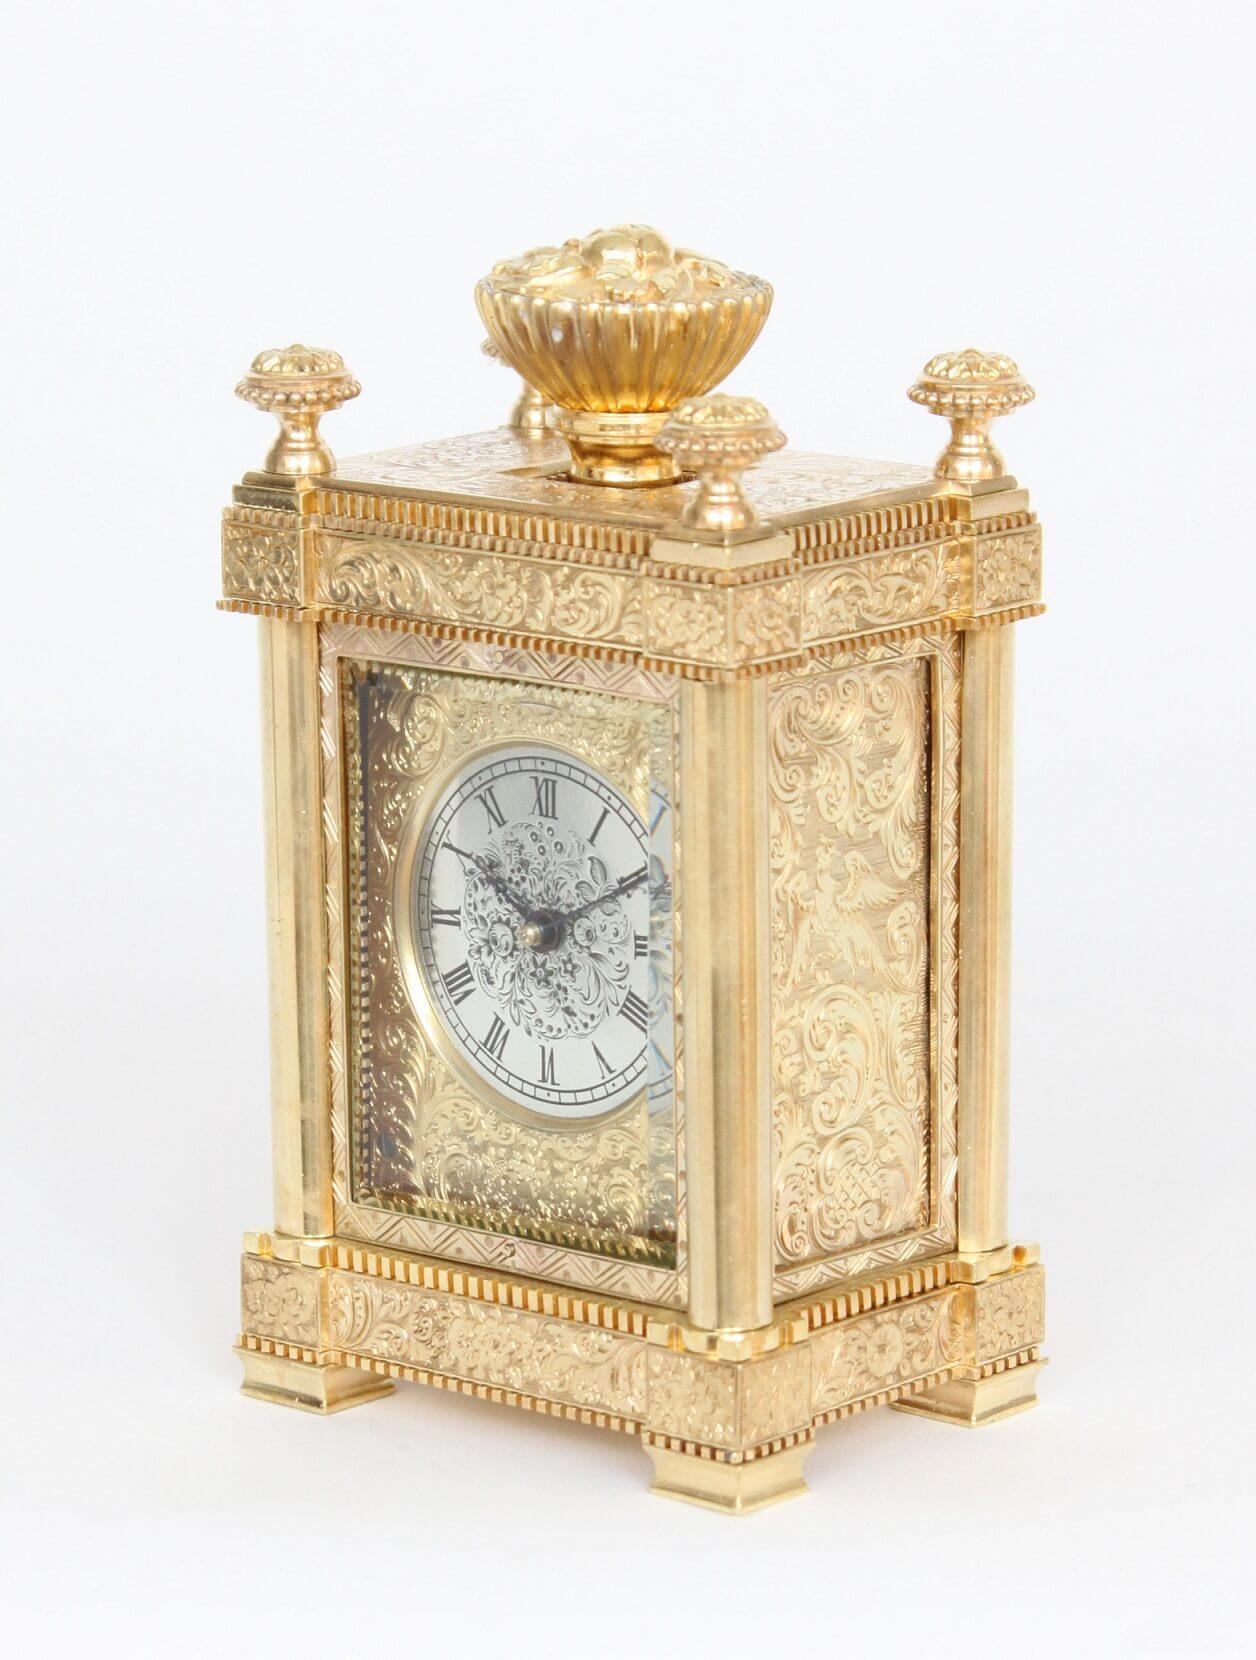 English-Victorian-engraved-gilt-brass-travel-carriage-clock-aubert-klaftenberger-London